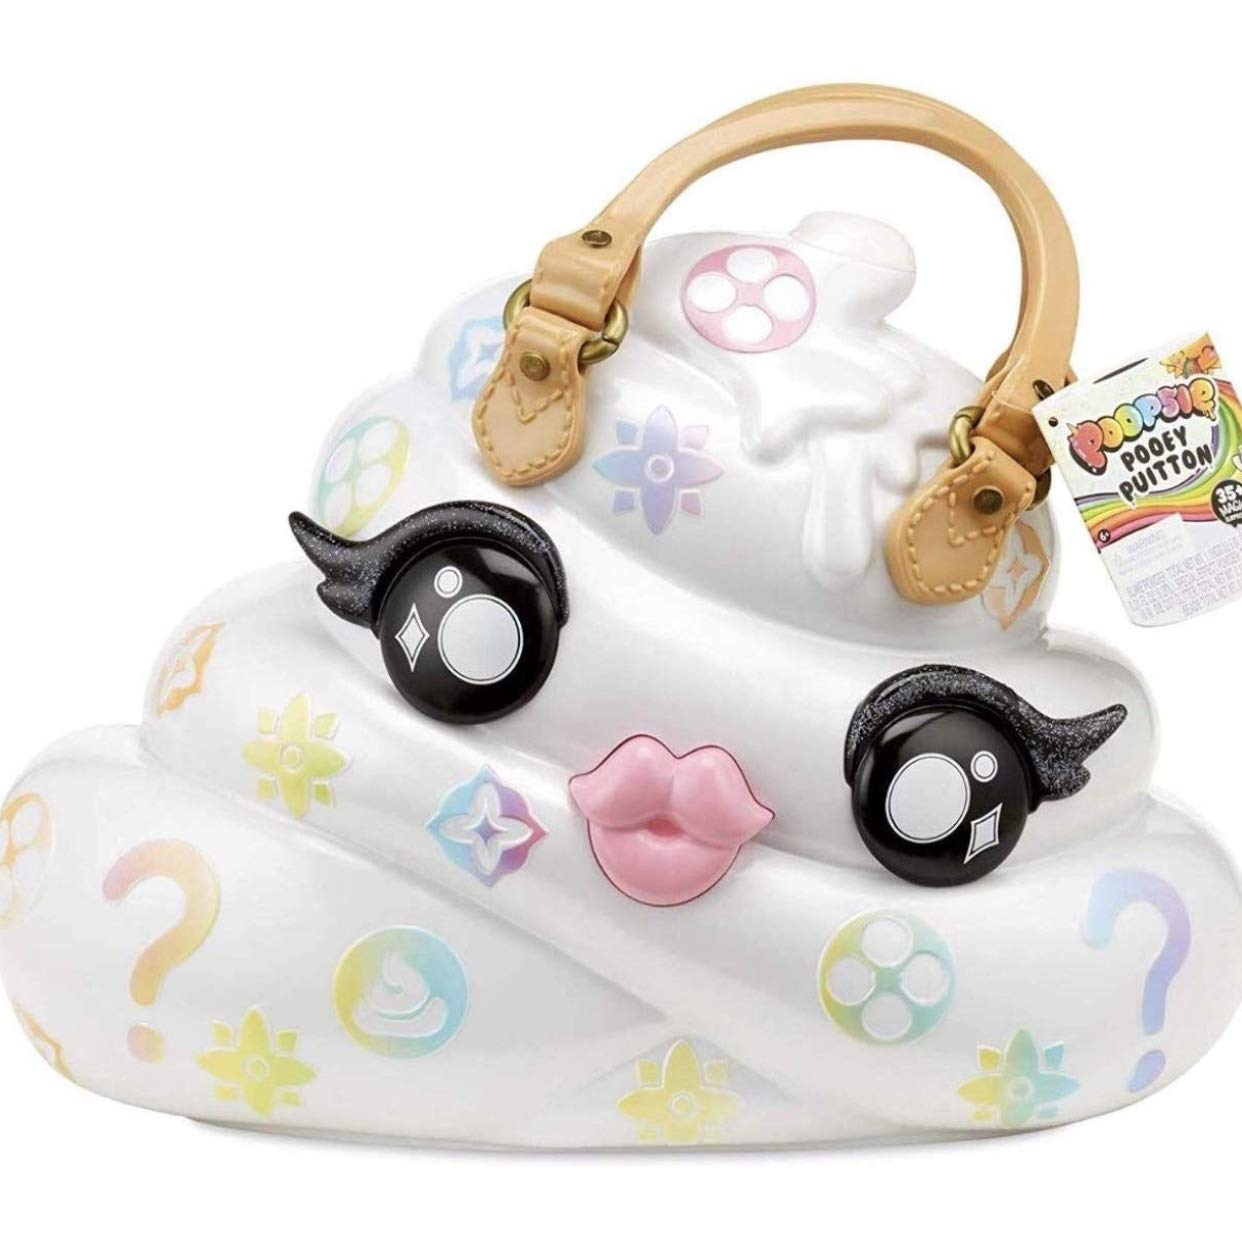 YB Poopsie Pooey Puitton Collectibles Girls Kids Toddlers Indoor Poopsie Slime Surprise (Bonus Donut Lipgloss) Pink Purple Plush Unicorn Stuff Toys Bundle of 4